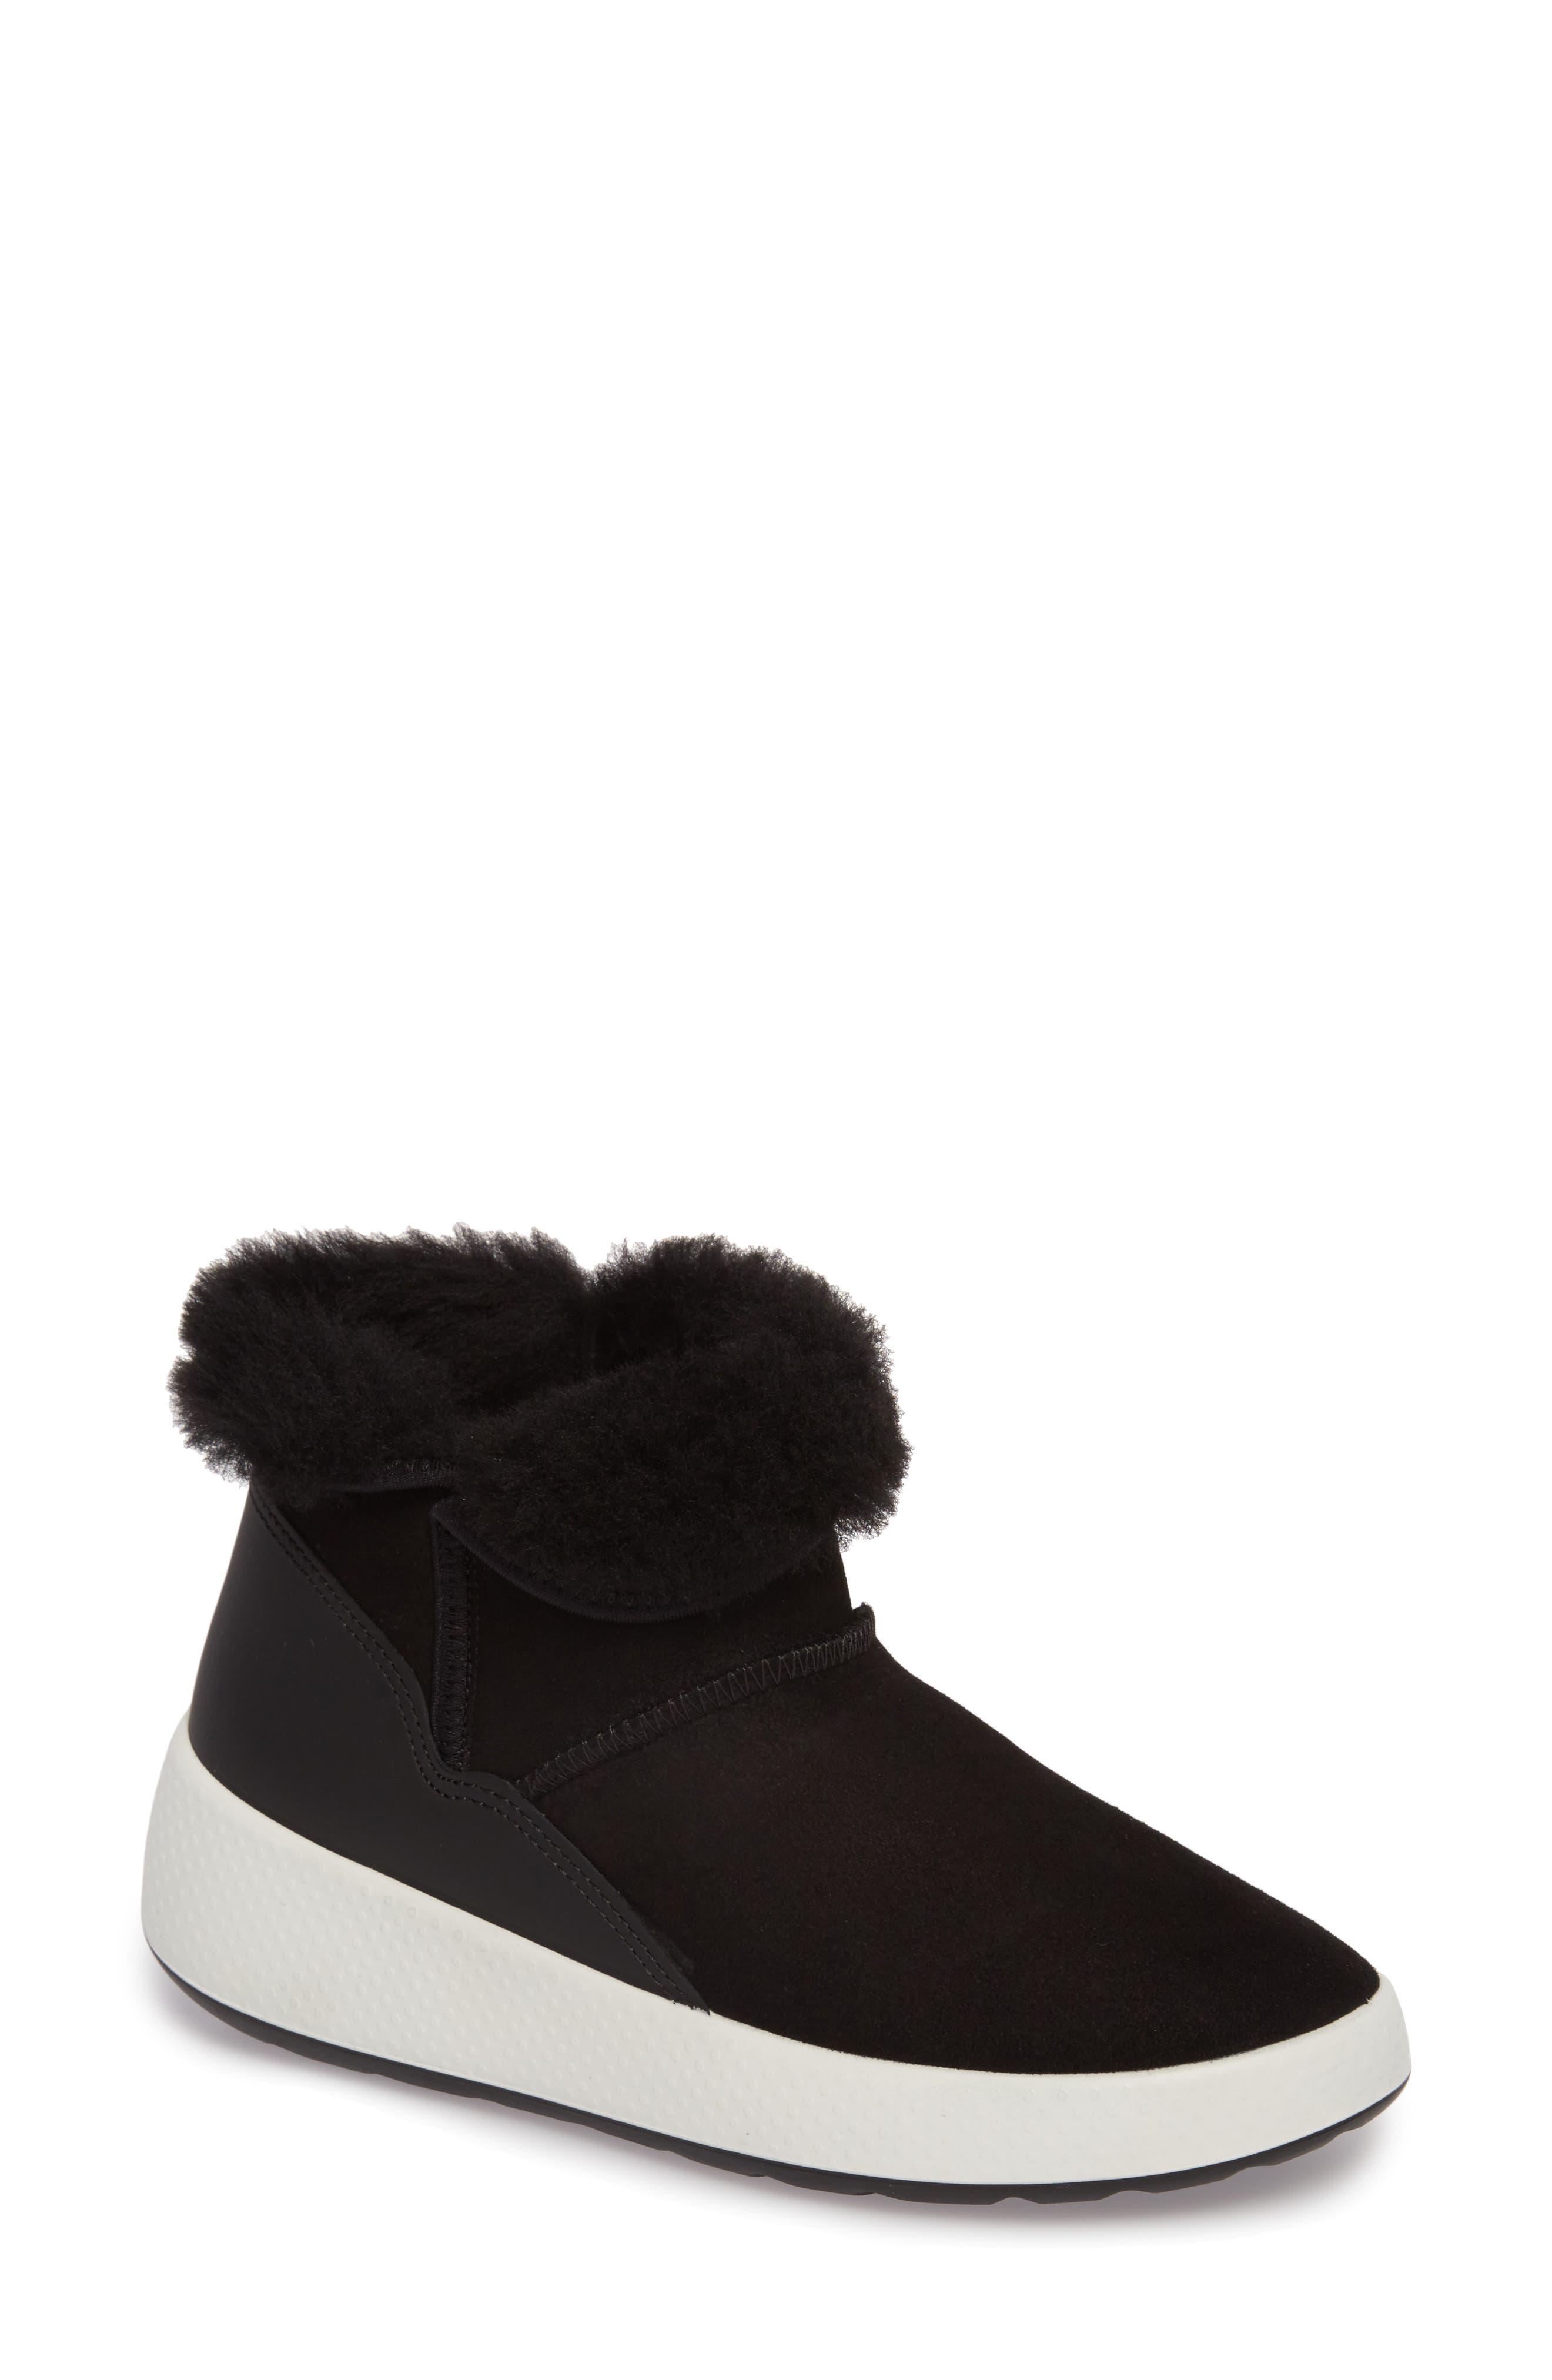 Ecco Ukiuk Genuine Shearling Boot, Black